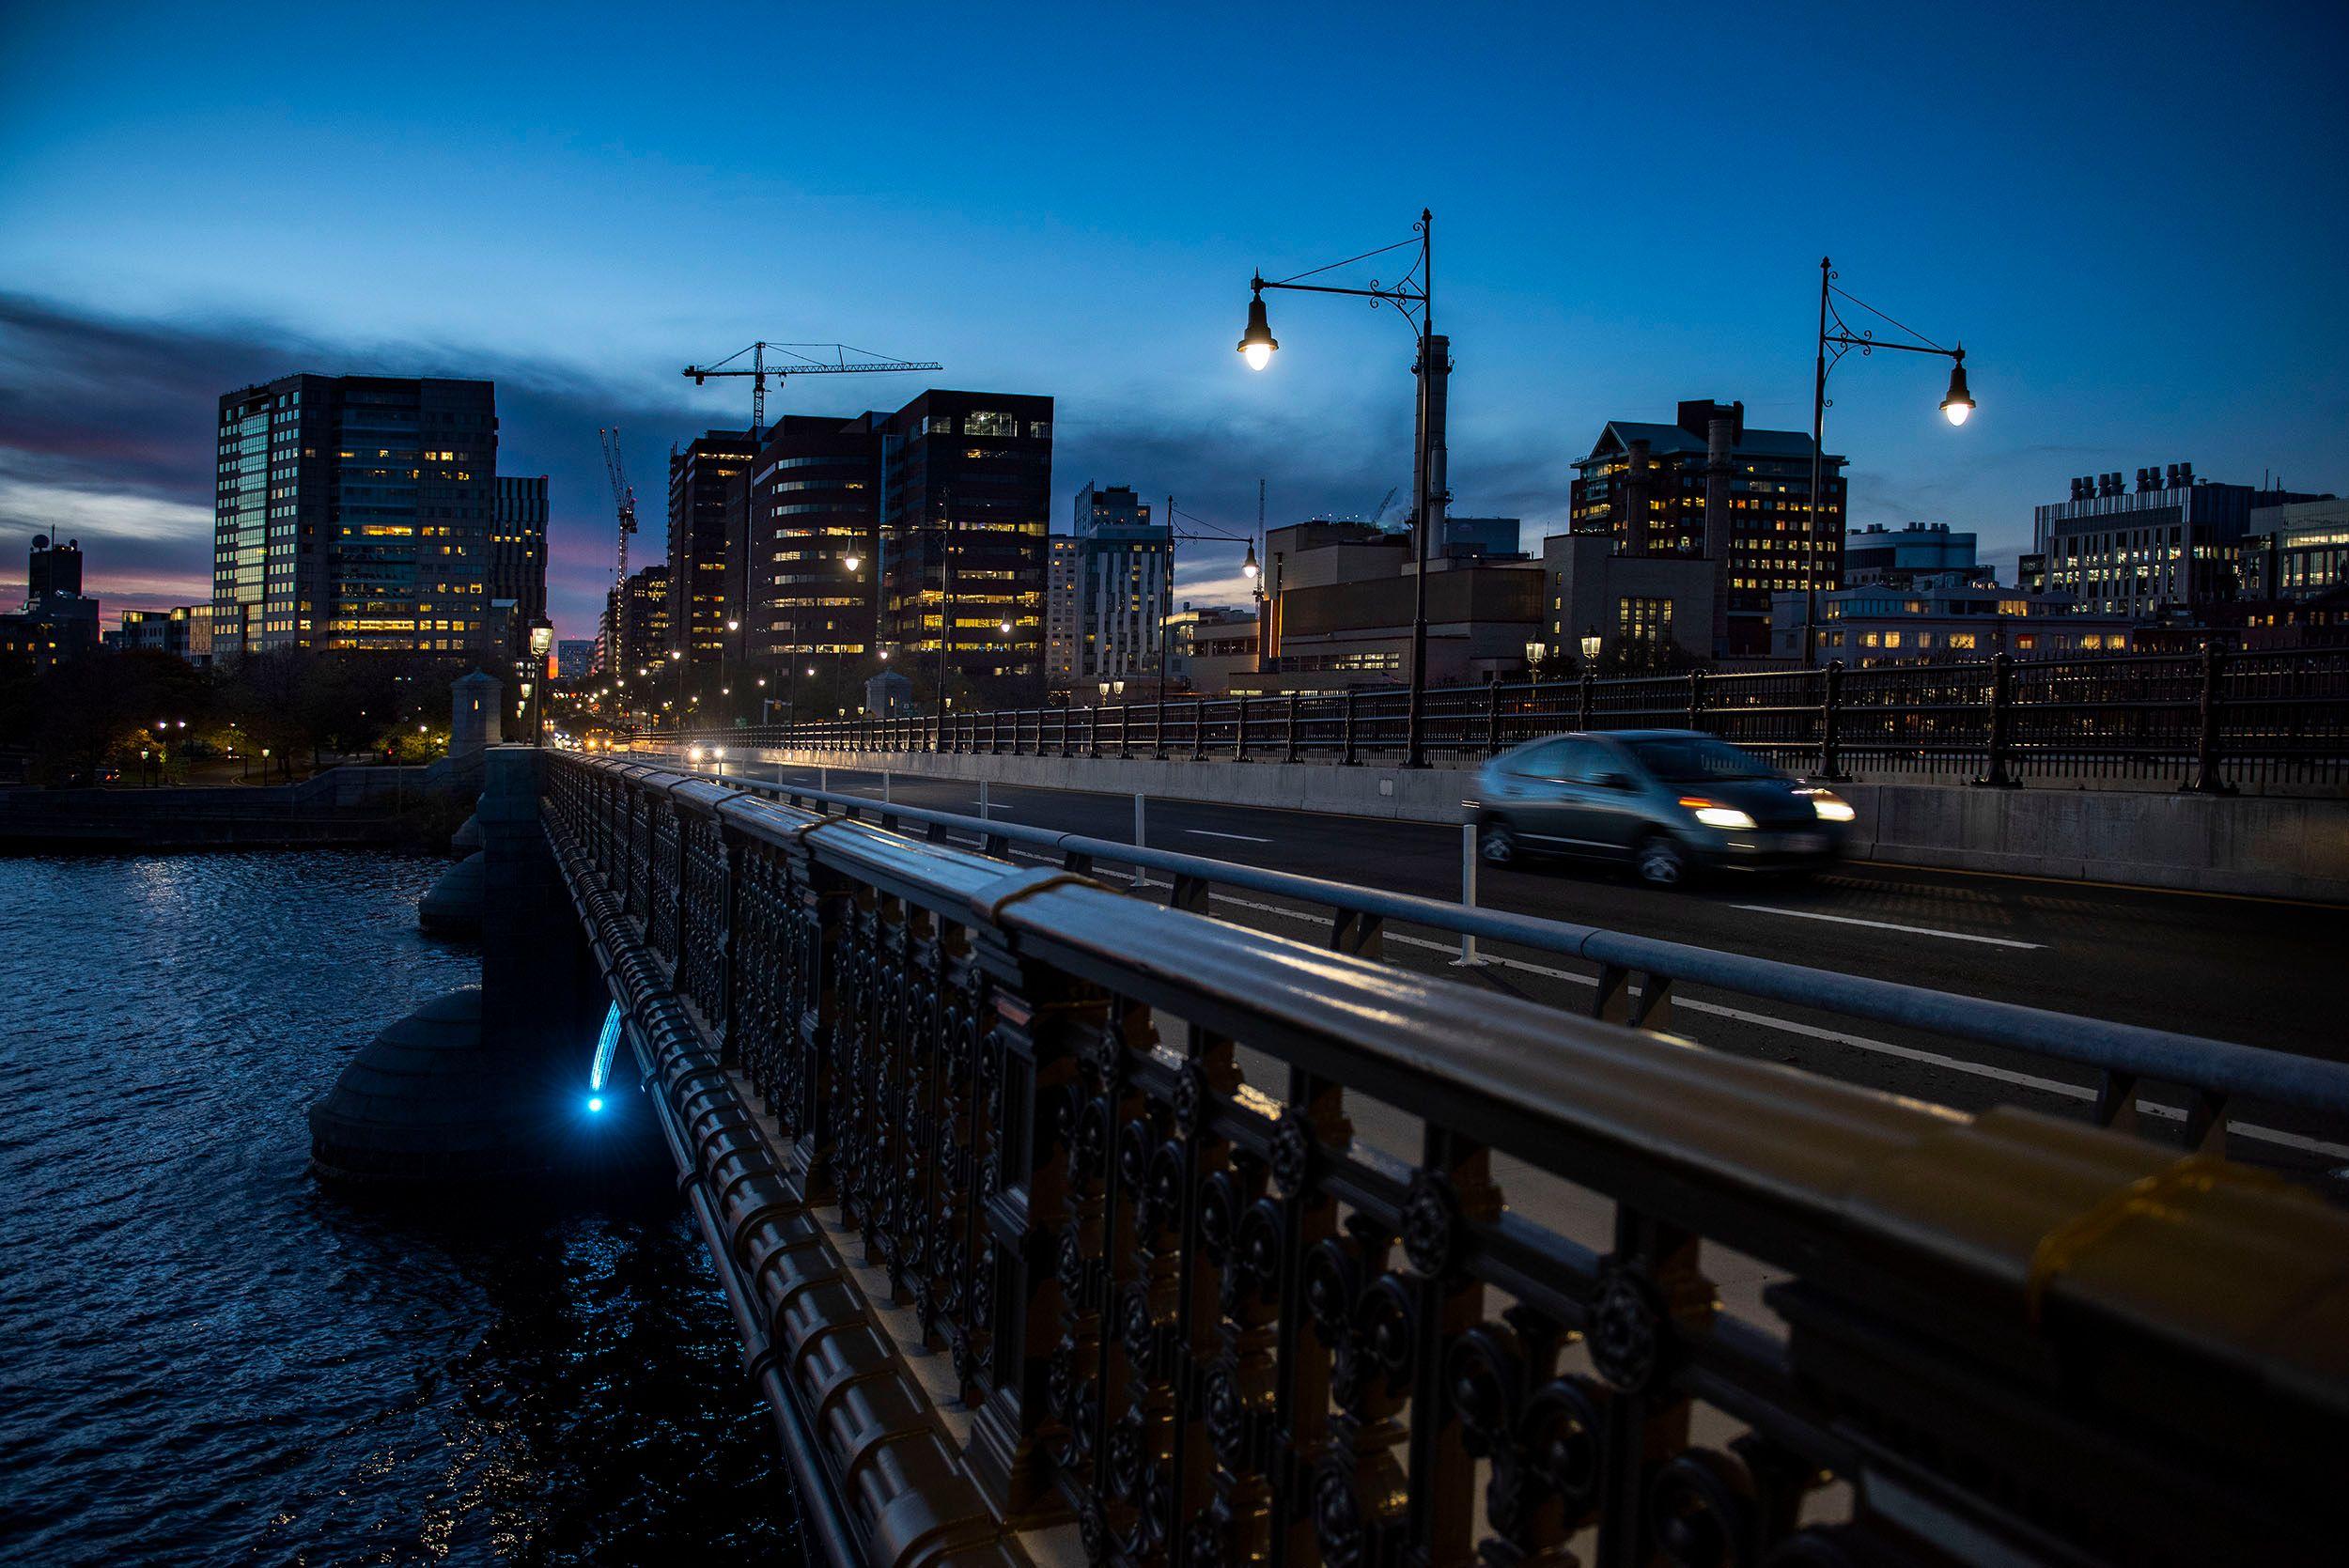 Boston Architectural Photography